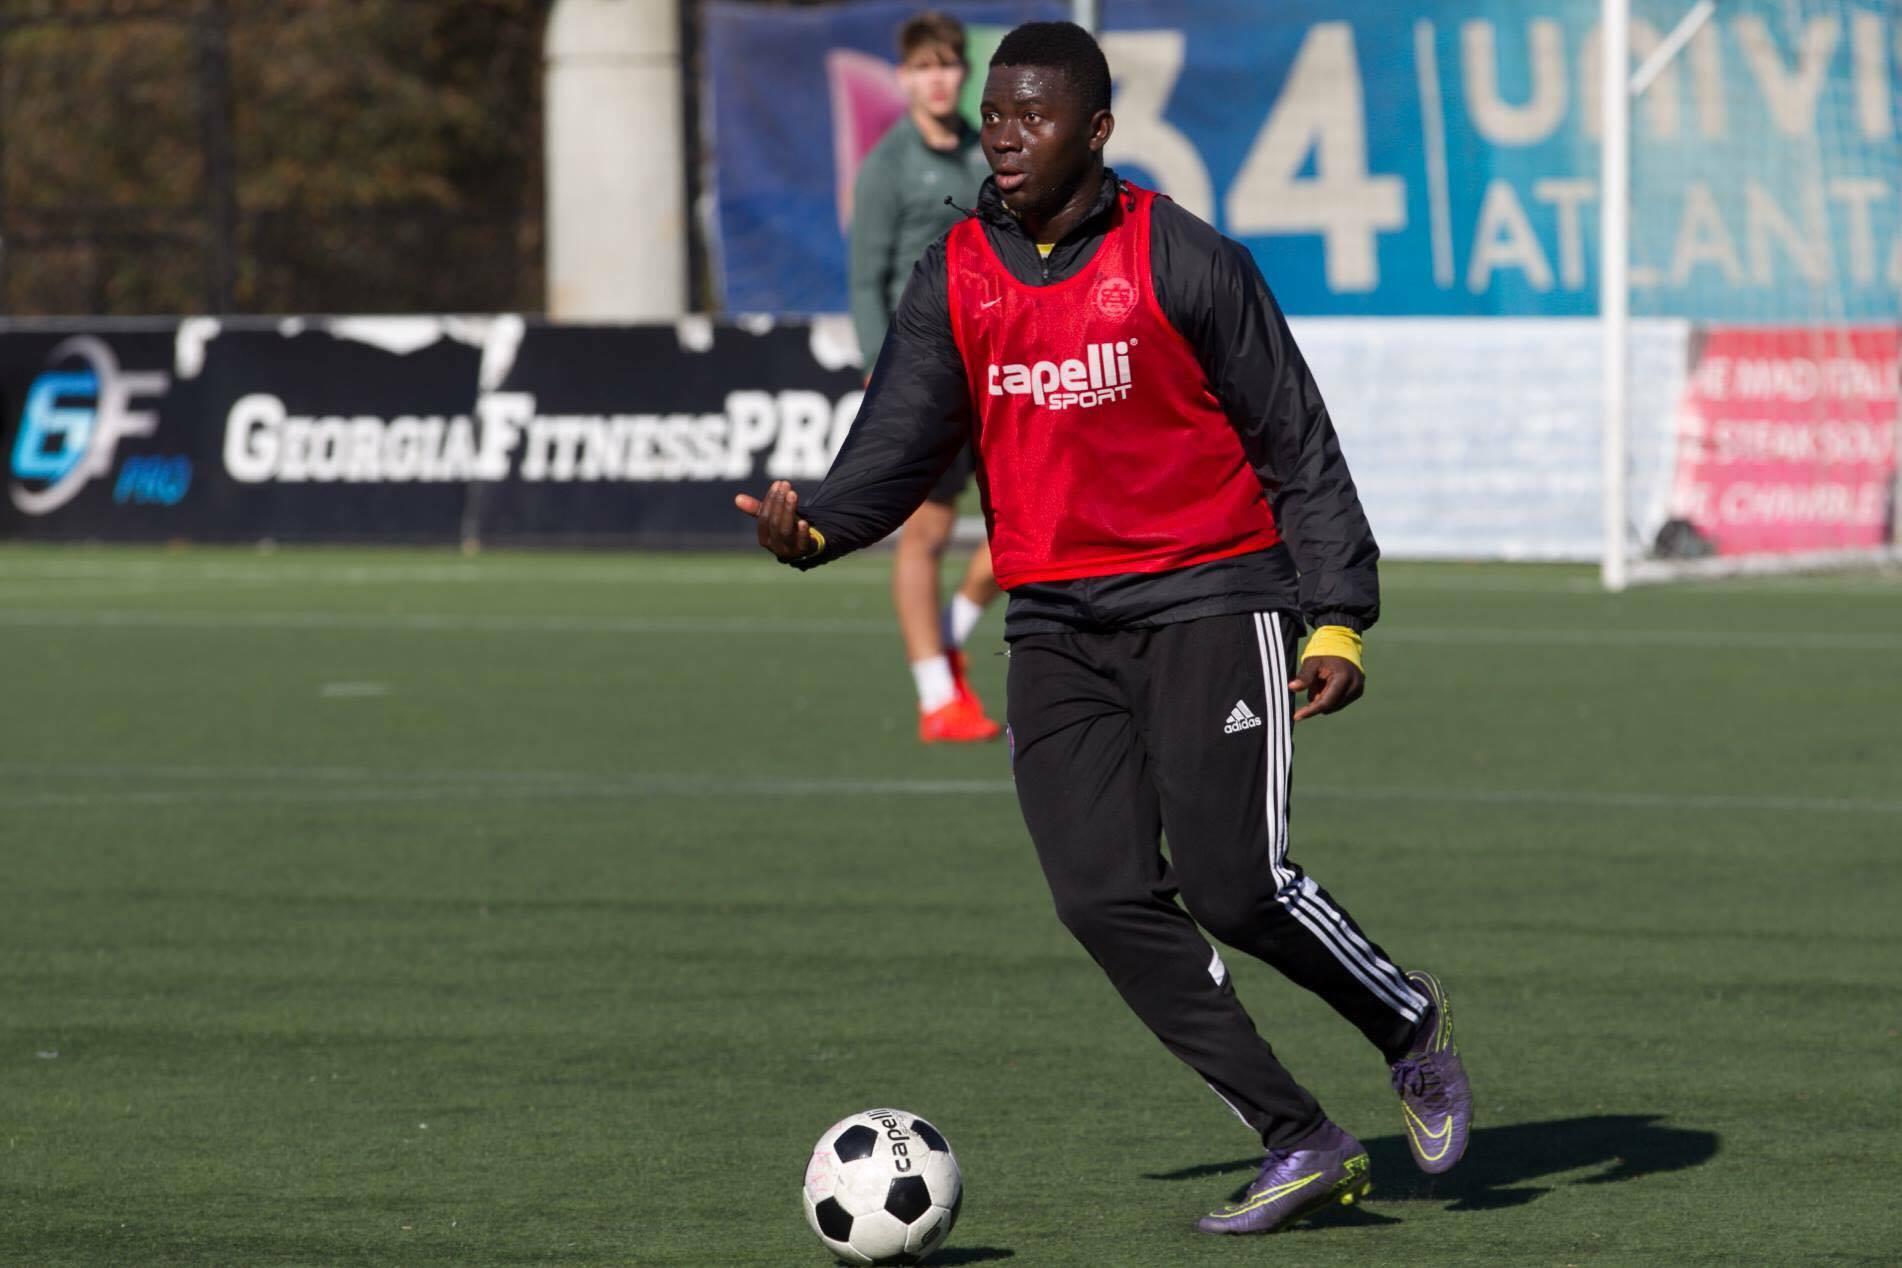 Atlanta Silverbacks skipper Abdul-rahman Bangura returns to training ahead of pre-season